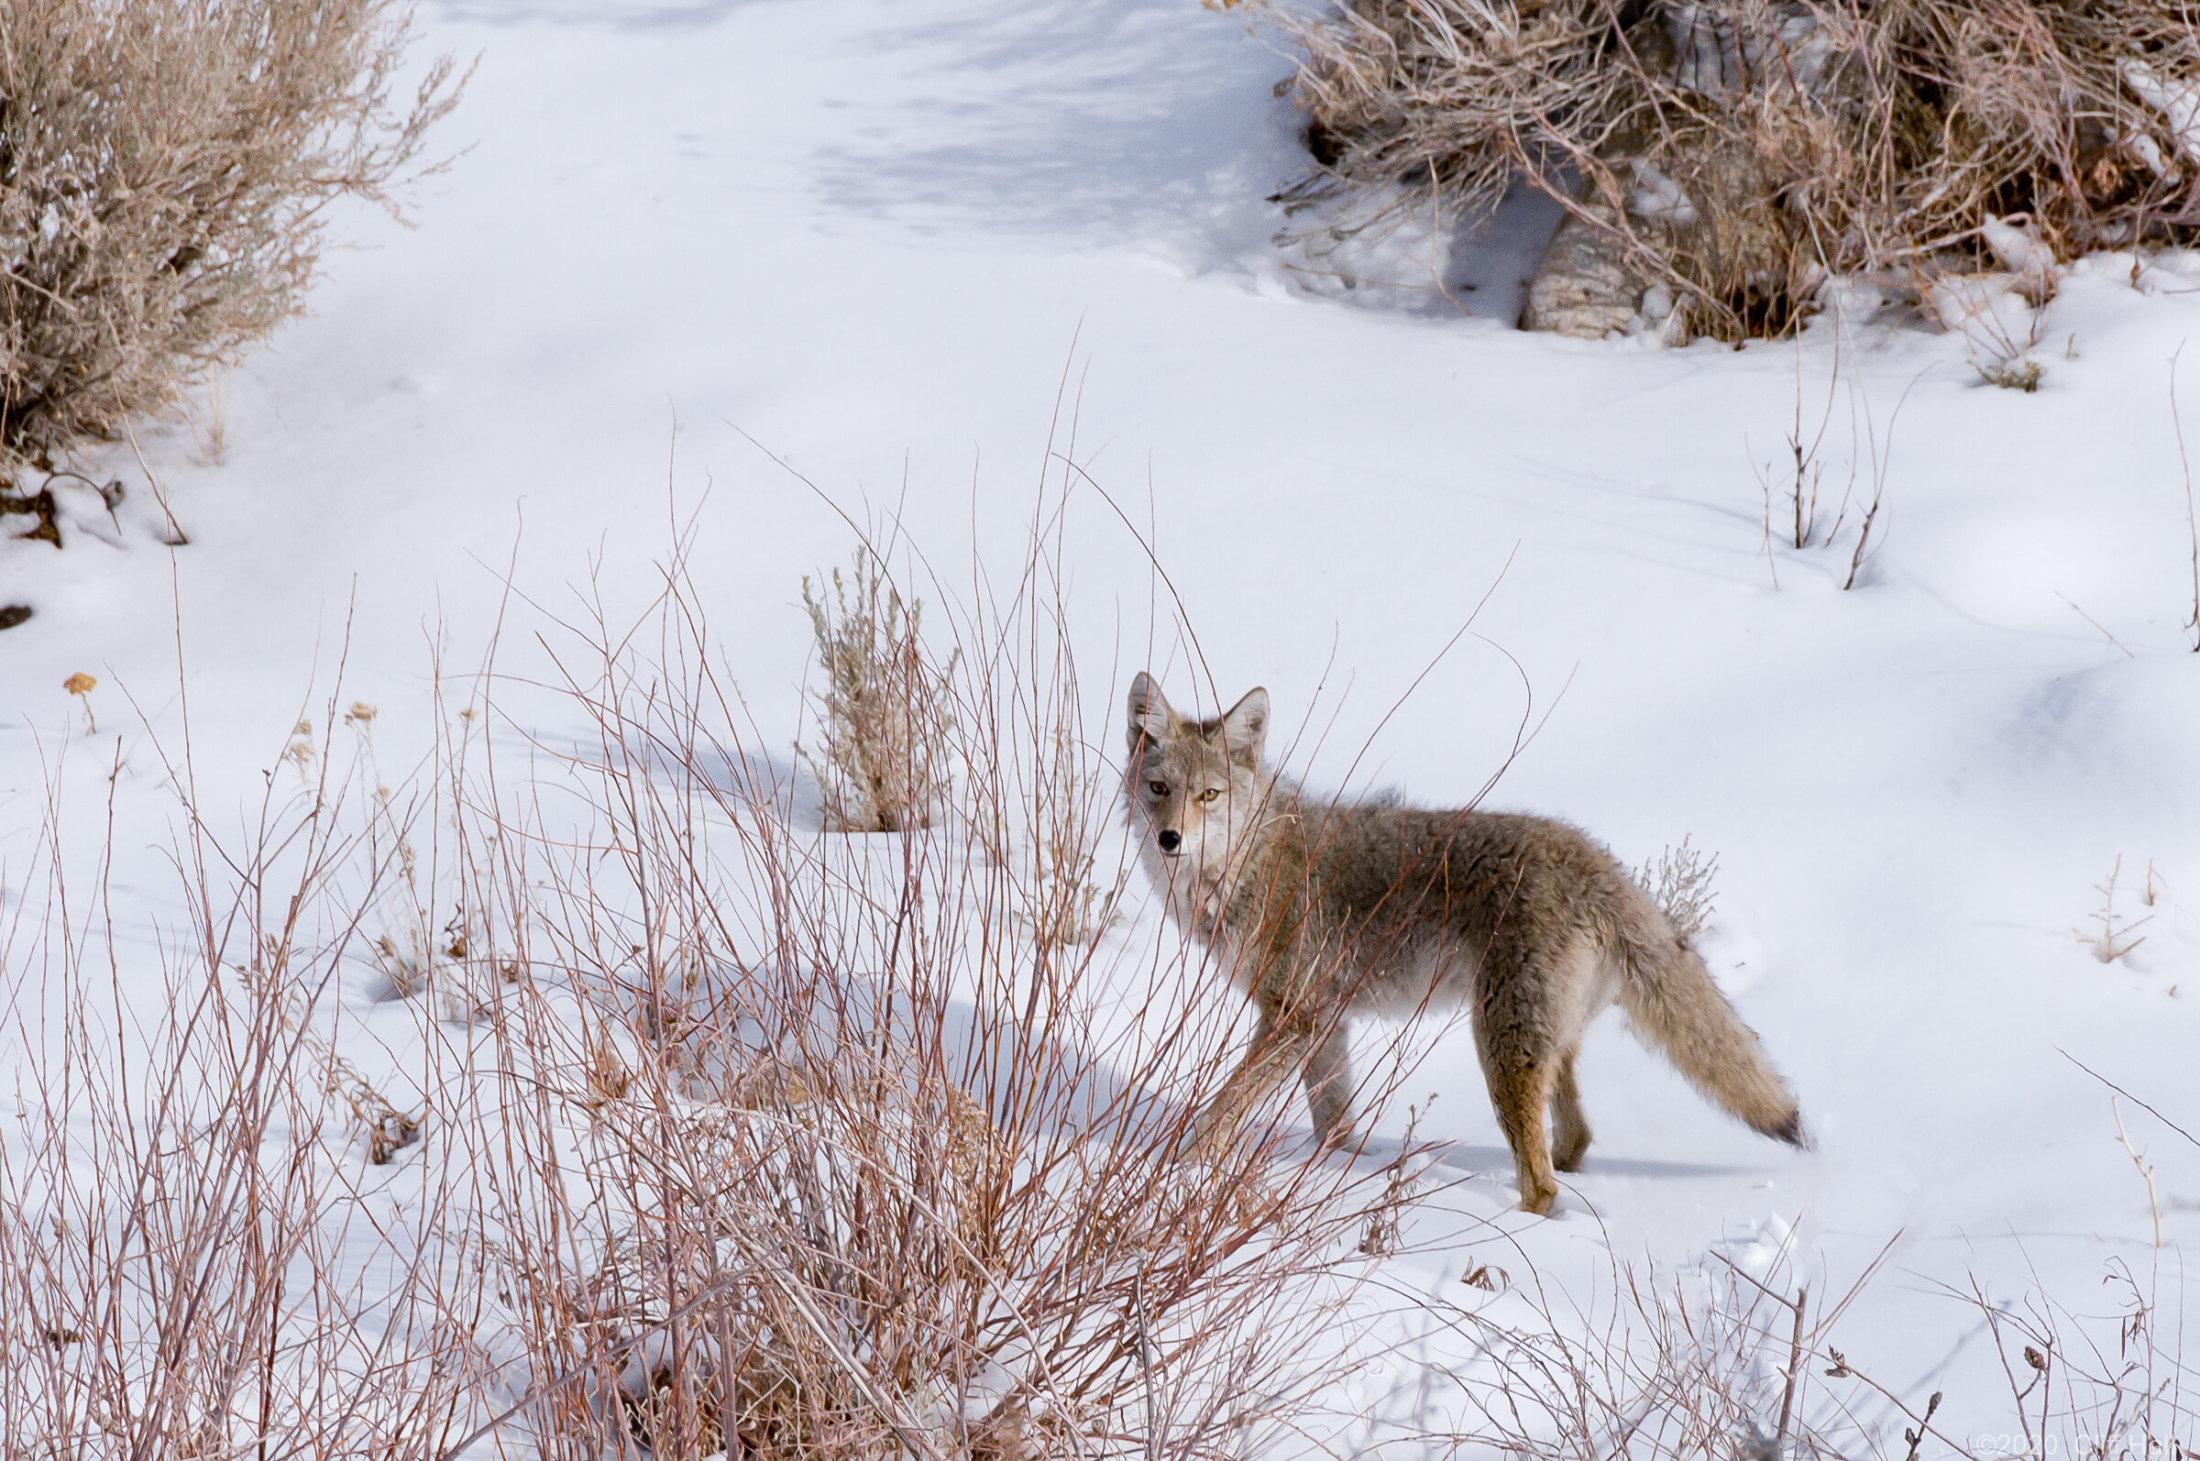 Coyote, with nice winter coat